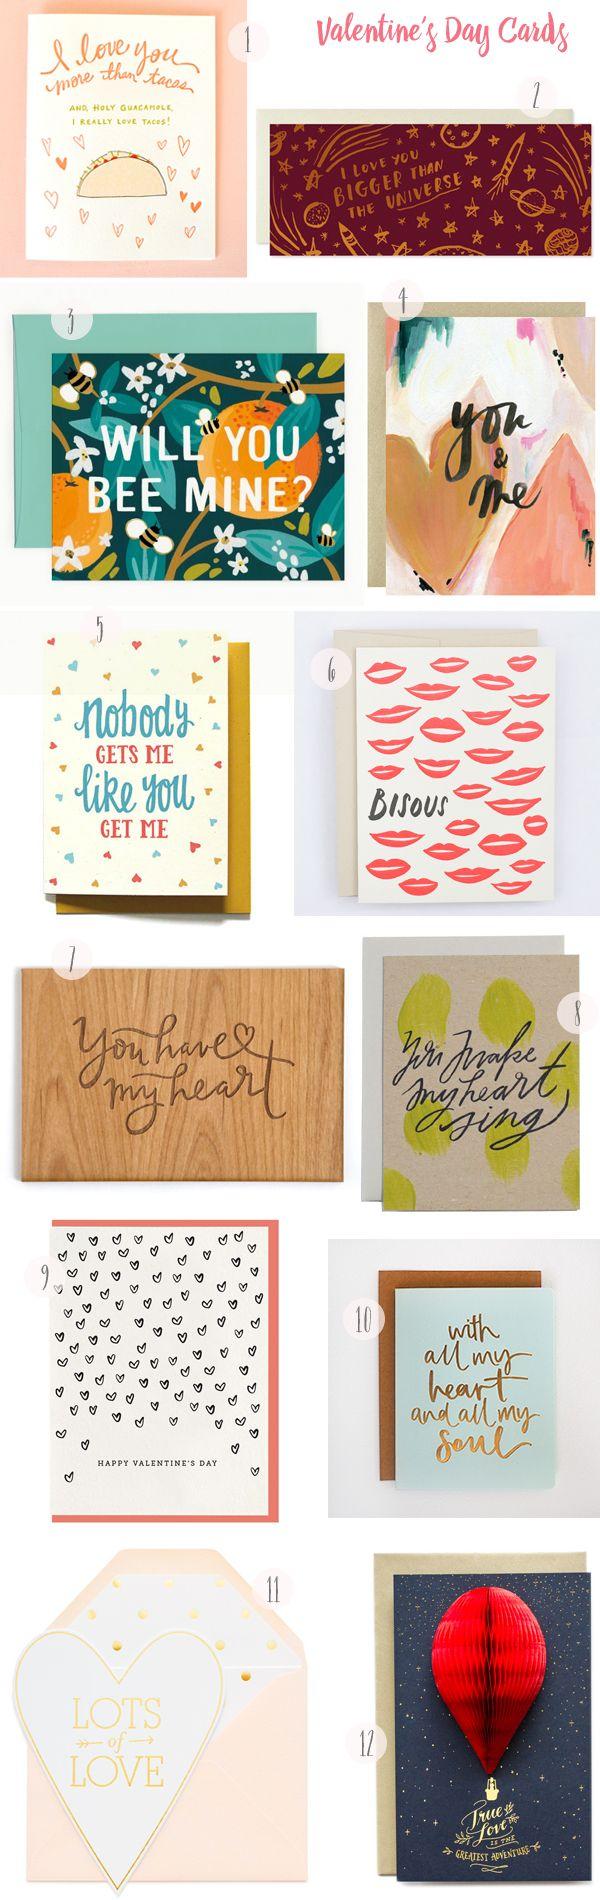 170b732692e50de109d3750117f0b026 valentine day cards valentine ideas - Seasonal Stationery: Valentine's Day Card Round Up / Oh So Beautiful Paper